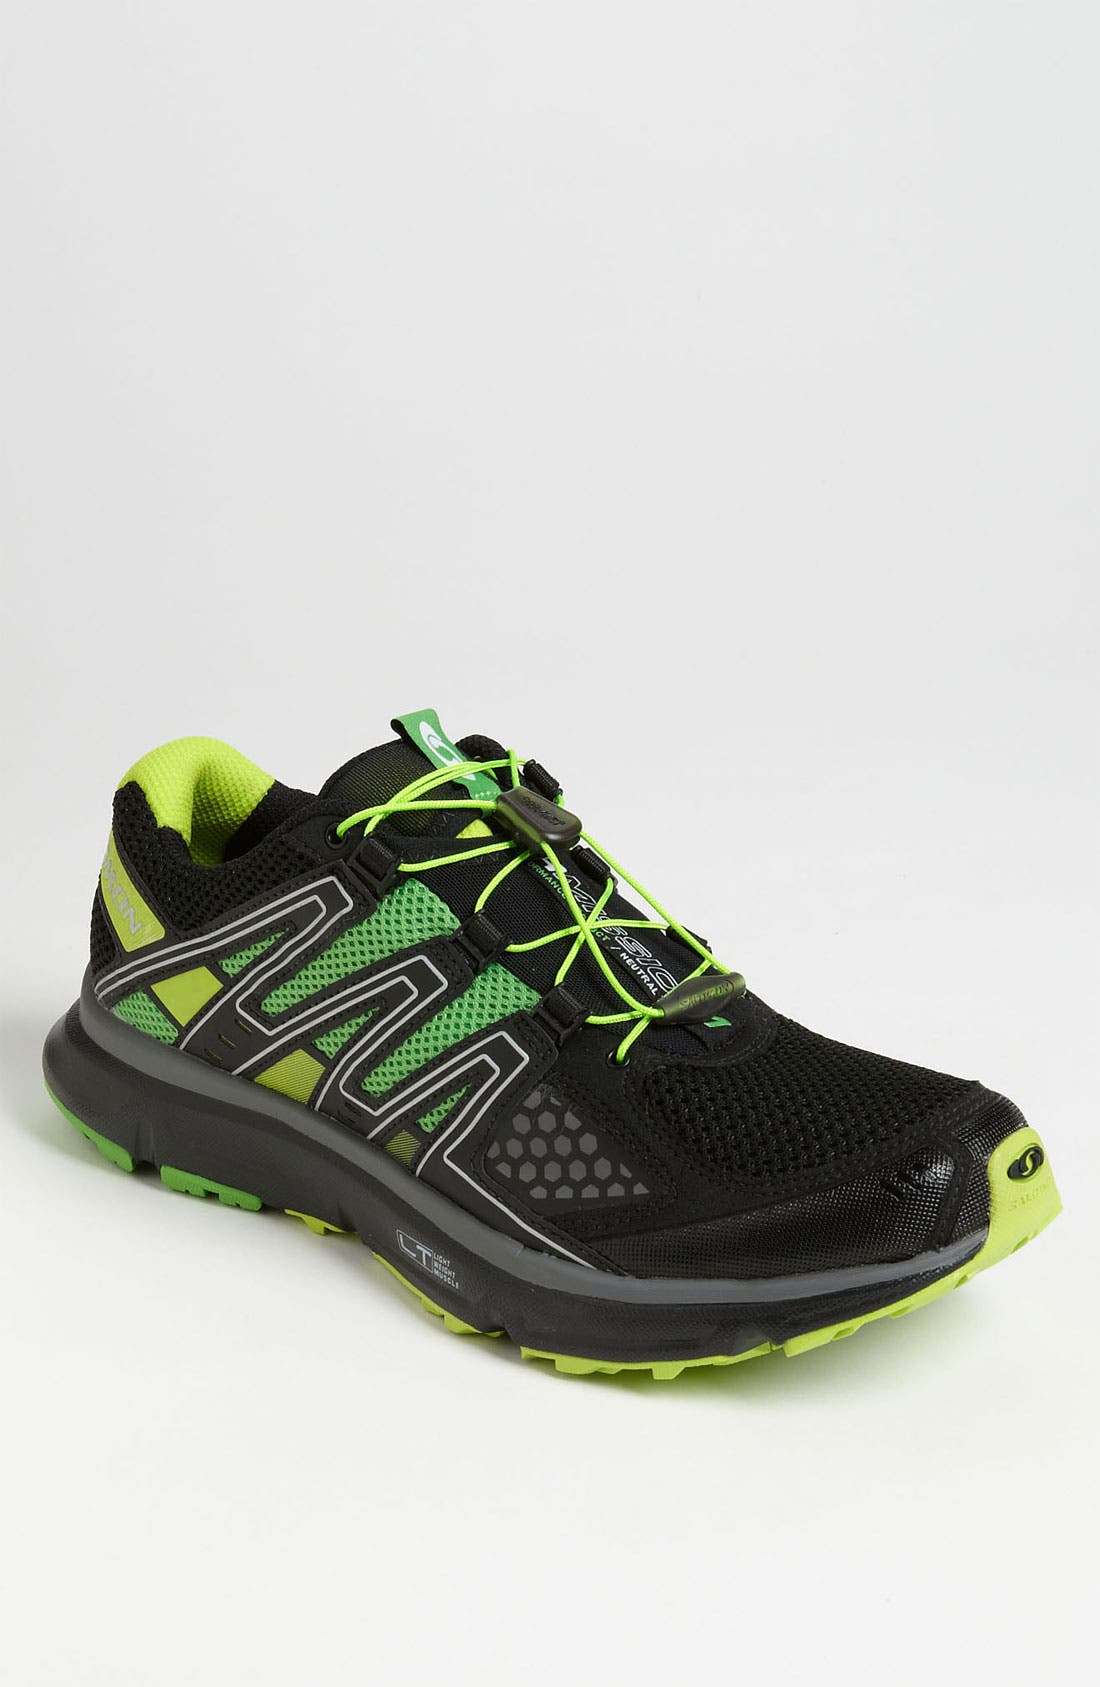 Main Image - Salomon 'XR Mission' Trail Running Shoe (Men)